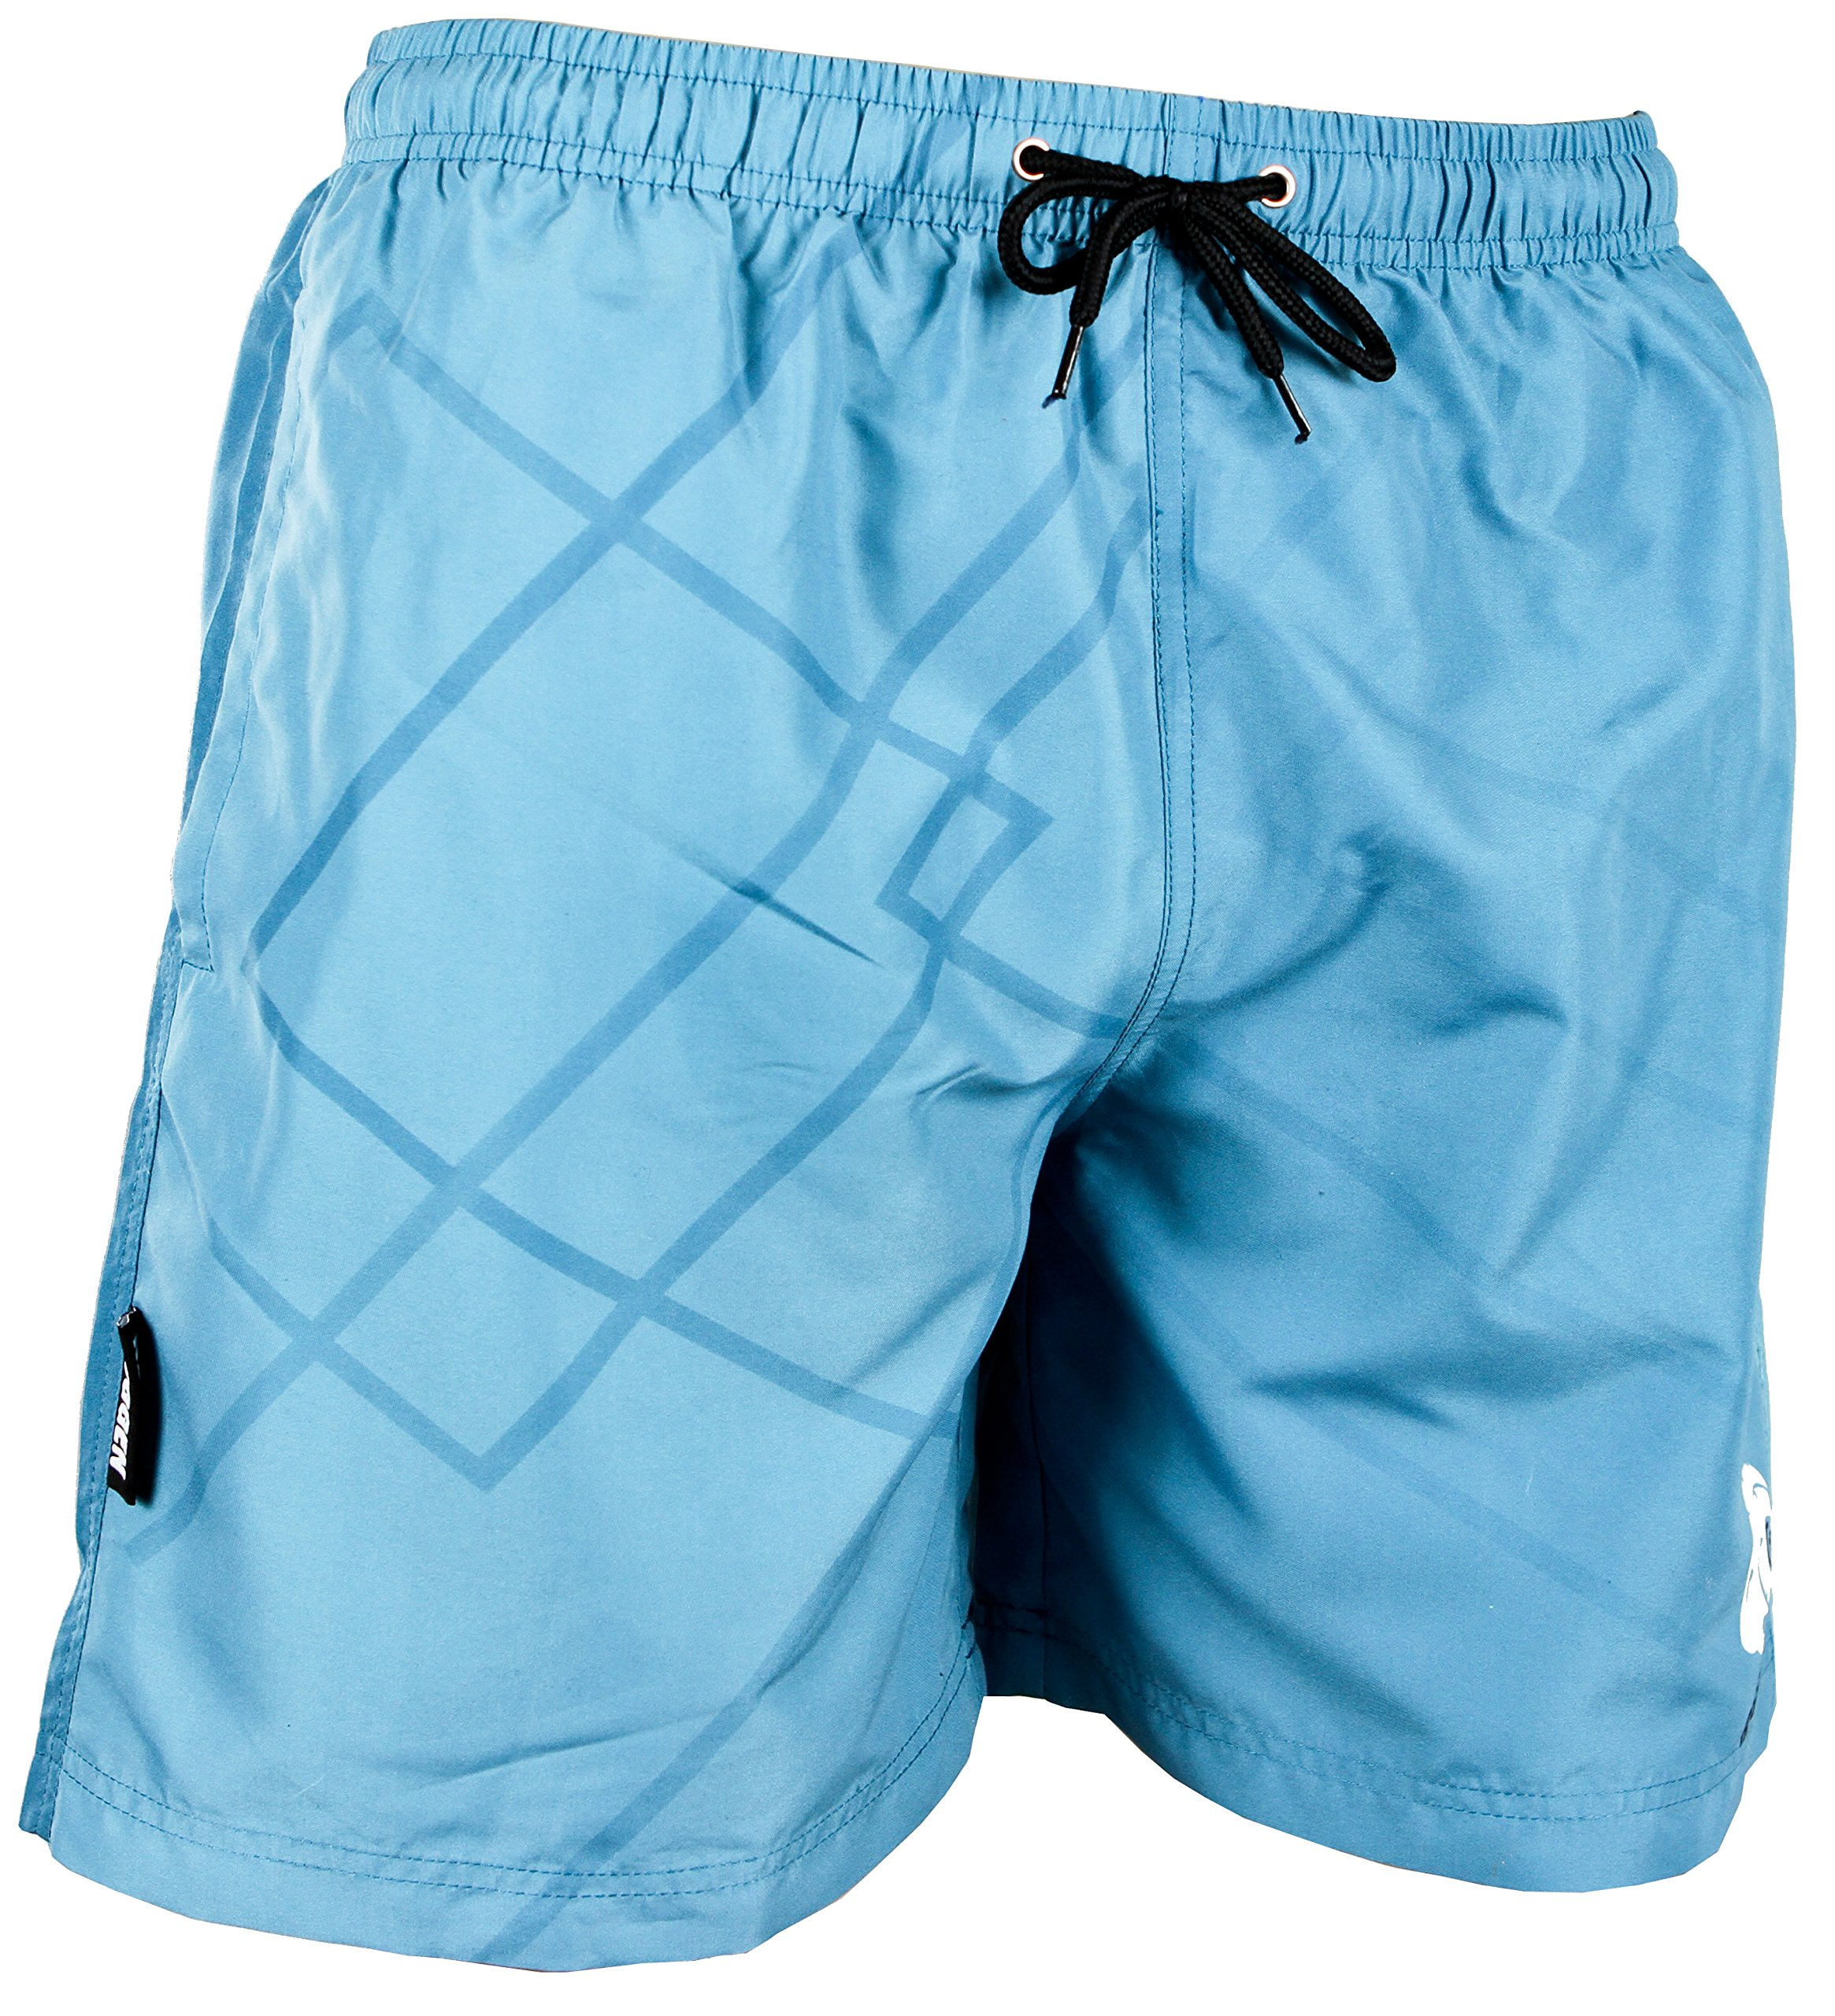 a69d90573 GUGGEN Banador de Natacion para Hombre Traje de Bano Azul - Mejores ...